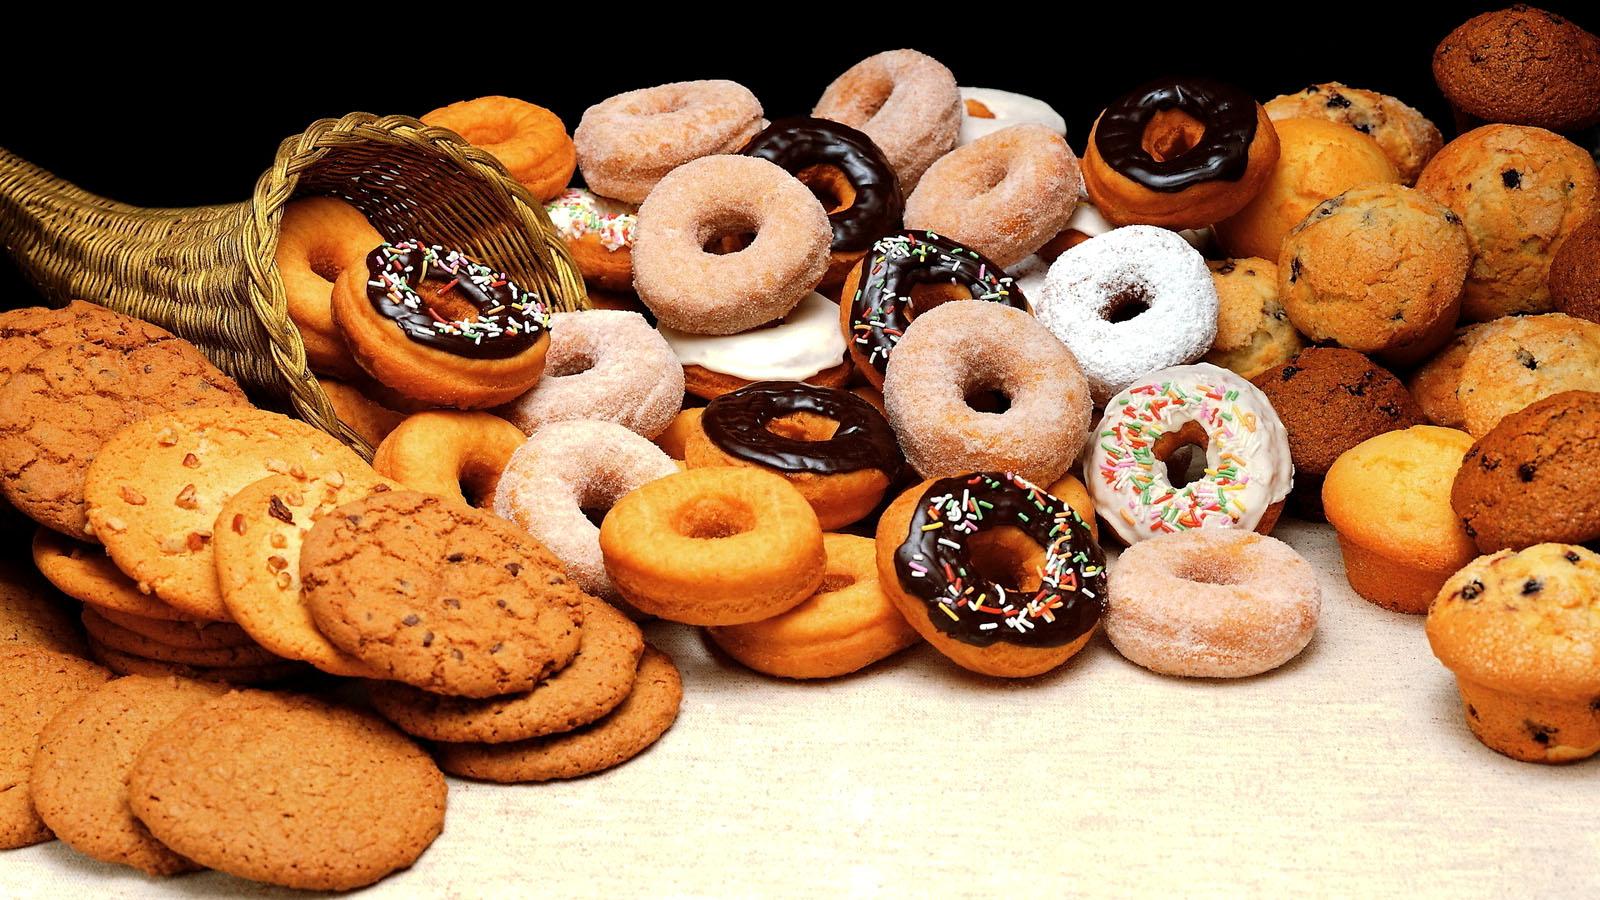 Cookies & donuts